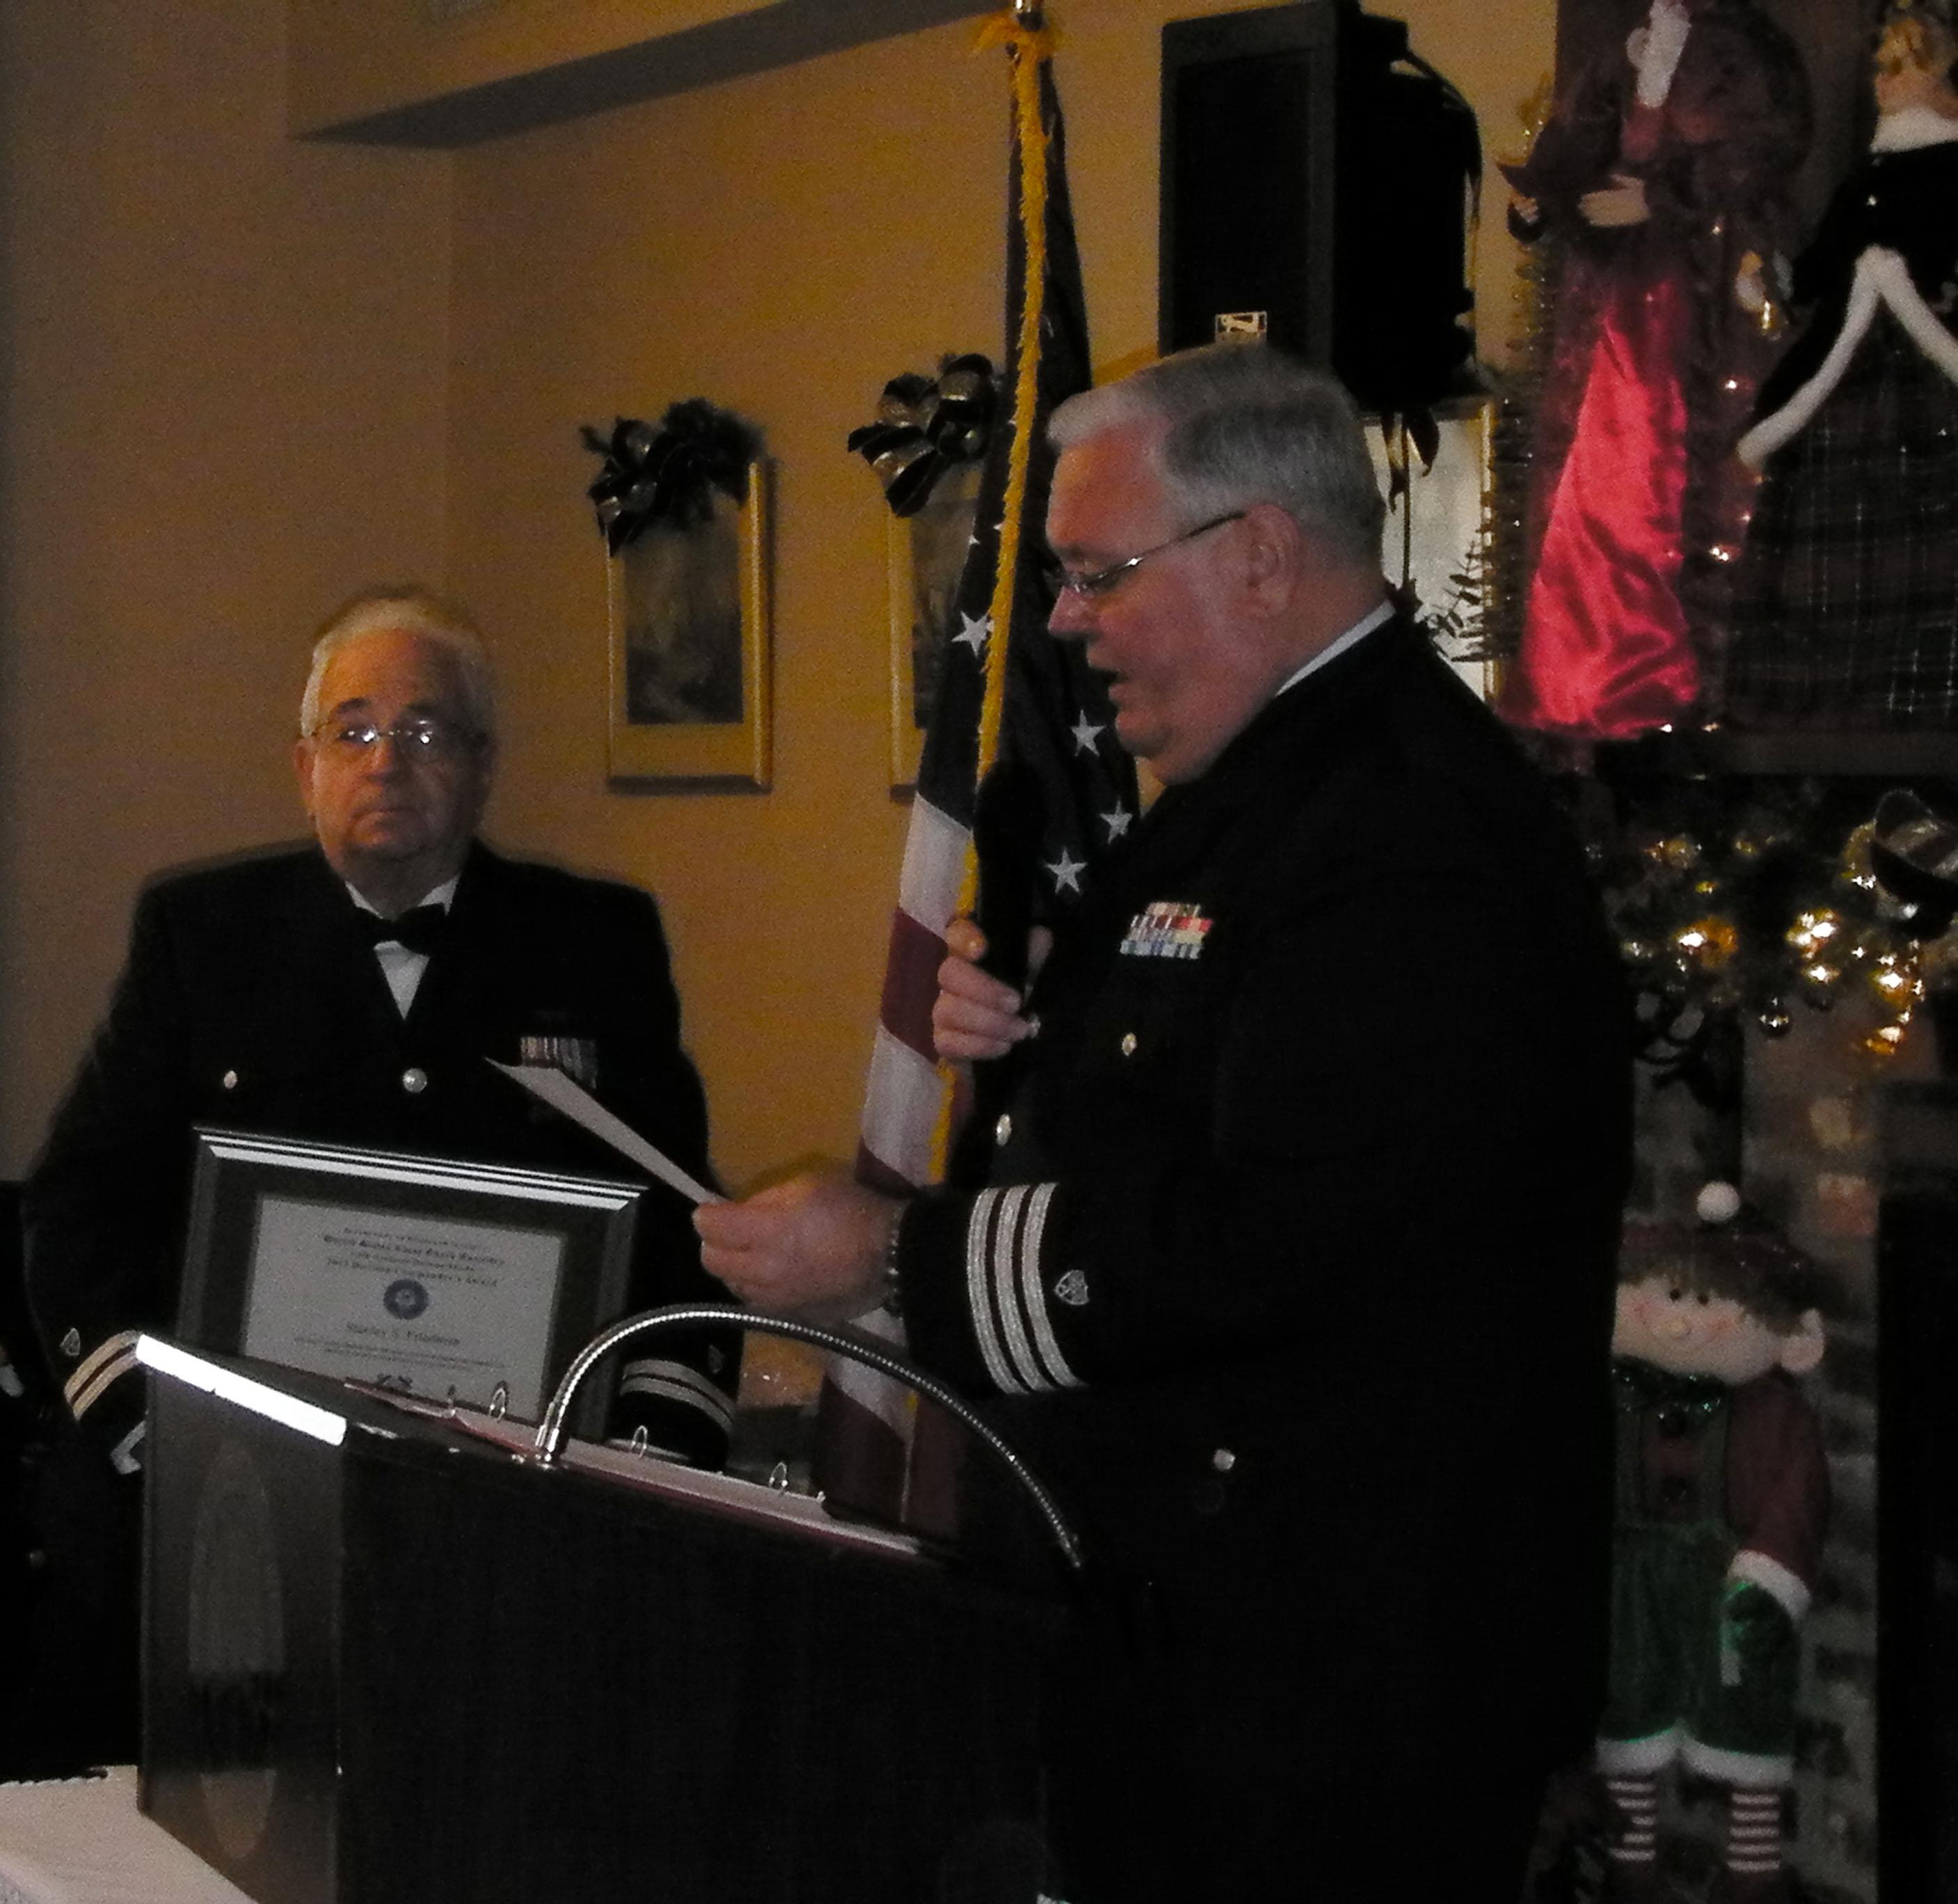 Dcdr Home: USCG Auxiliary Flotilla 8-5(5NR), Brigantine, NJ